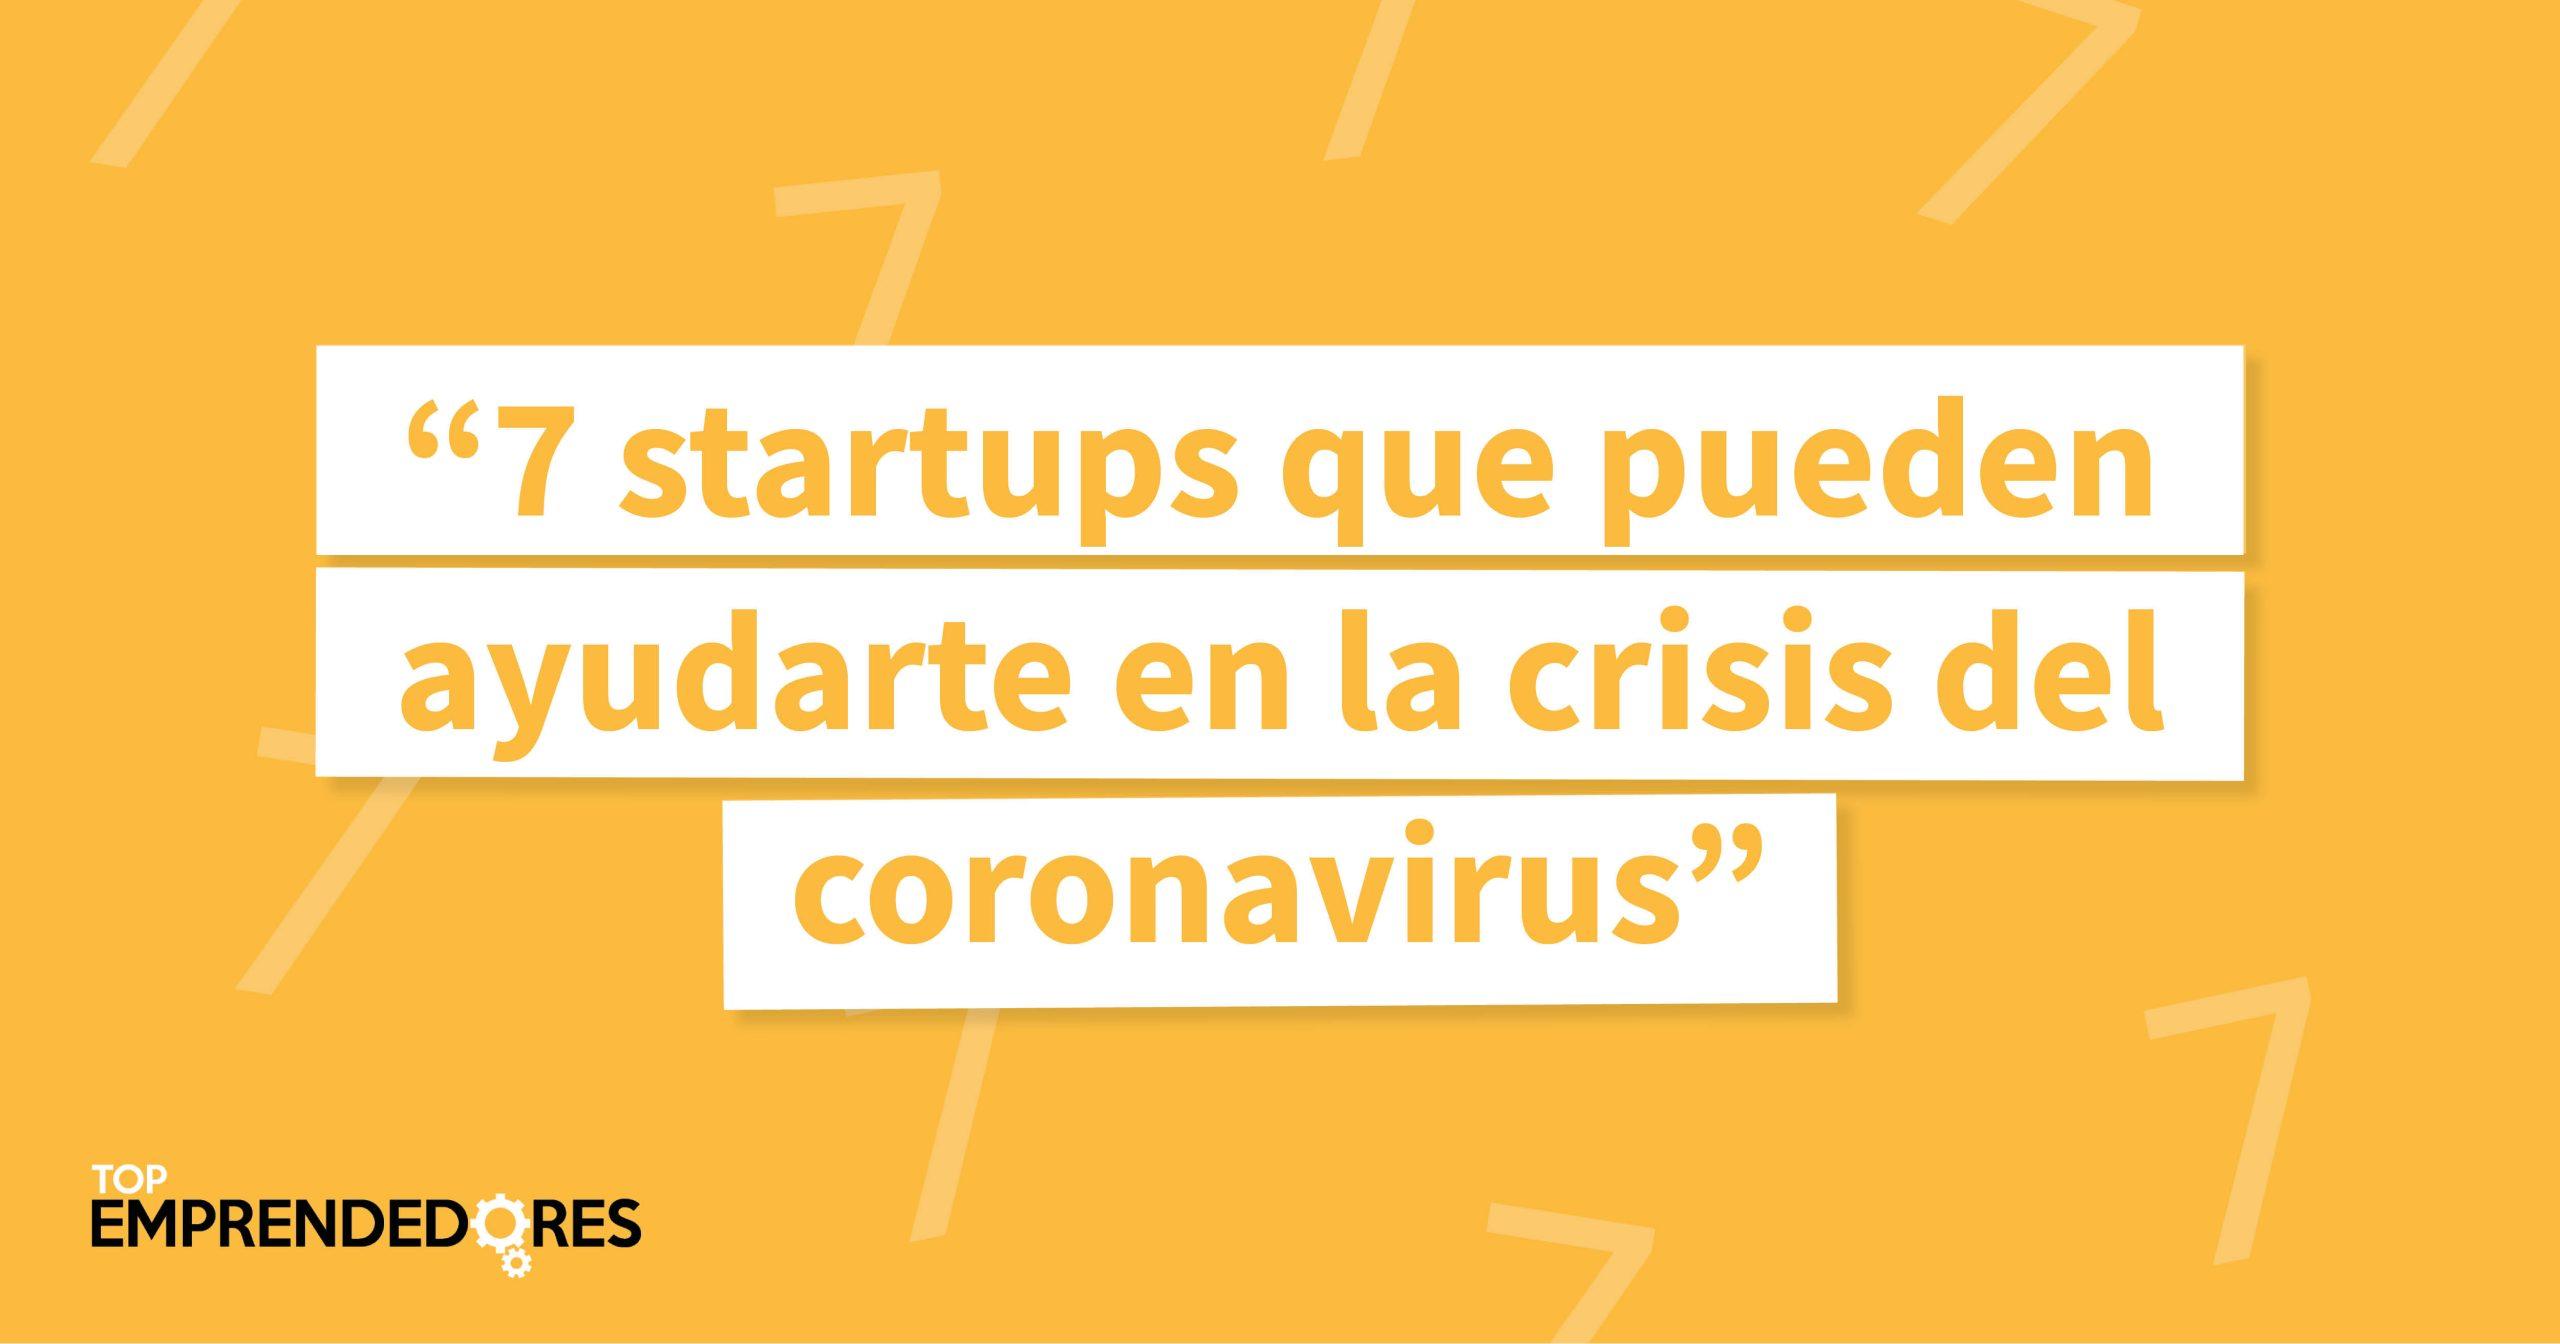 coronavirus-7-startups-ayudarte-crisis